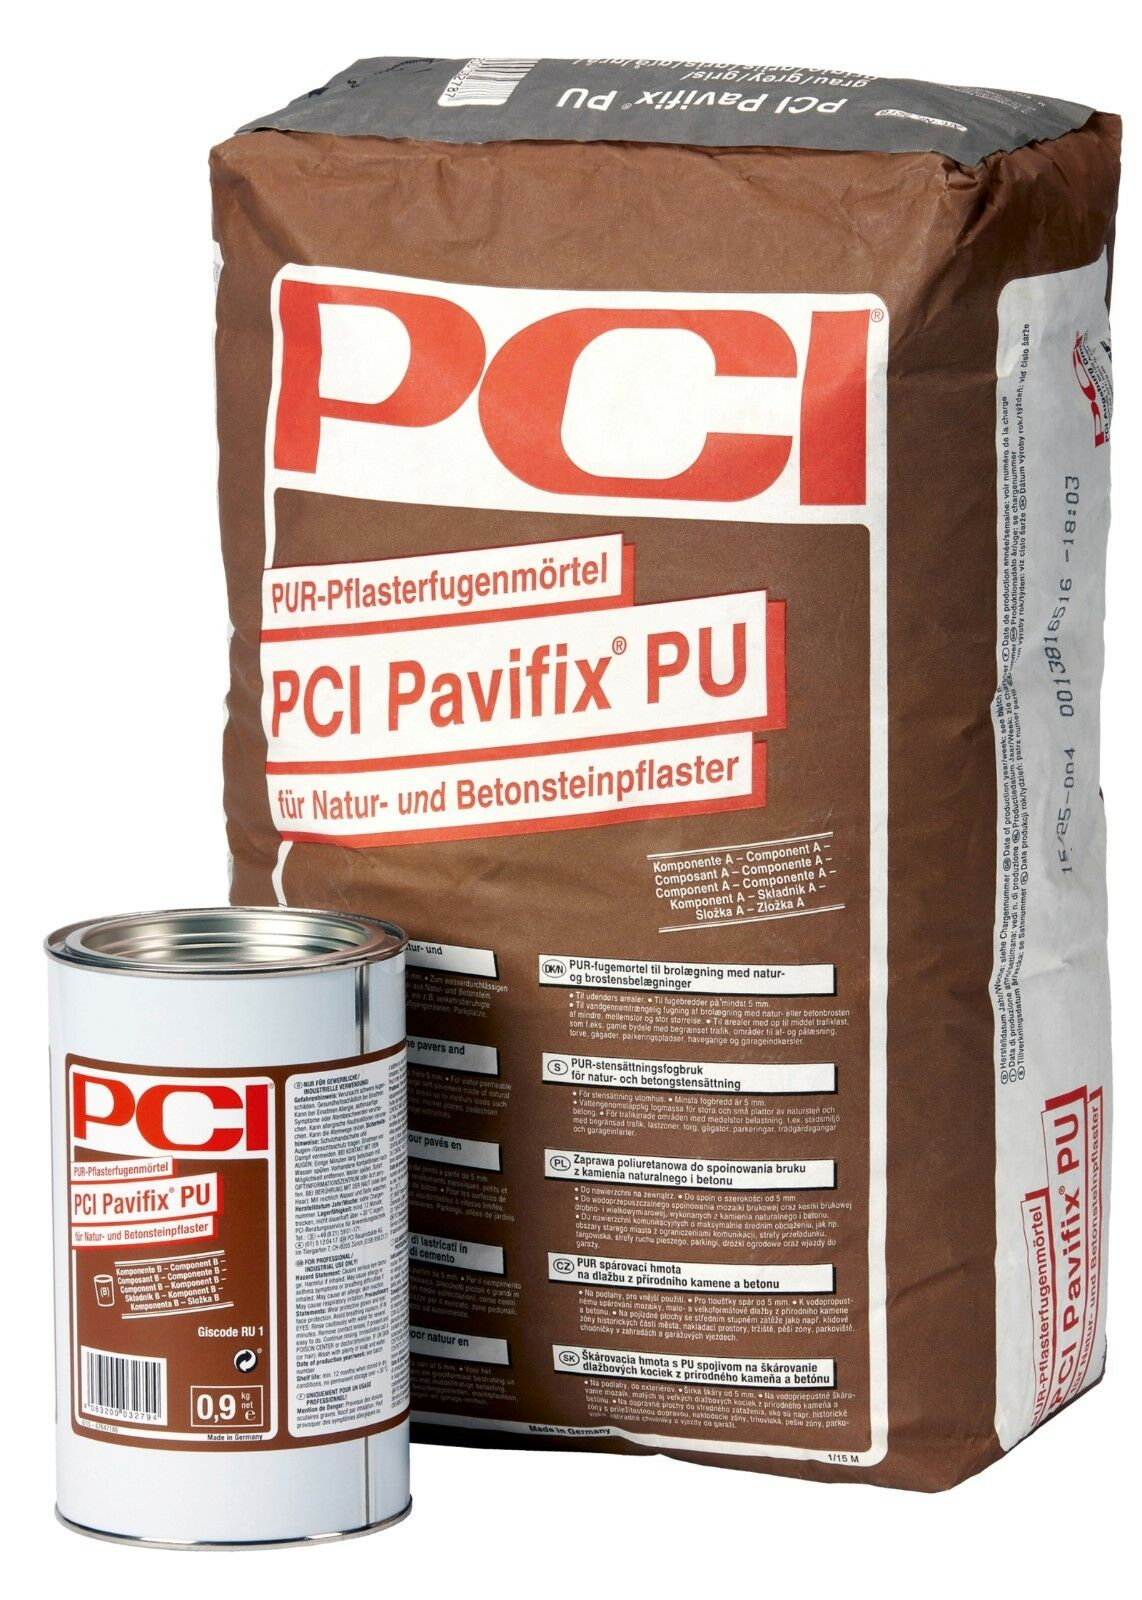 PCI Anthracite Pavifix Pu 20,9 kg Anthracite PCI para Fugas Fuga 8527d8